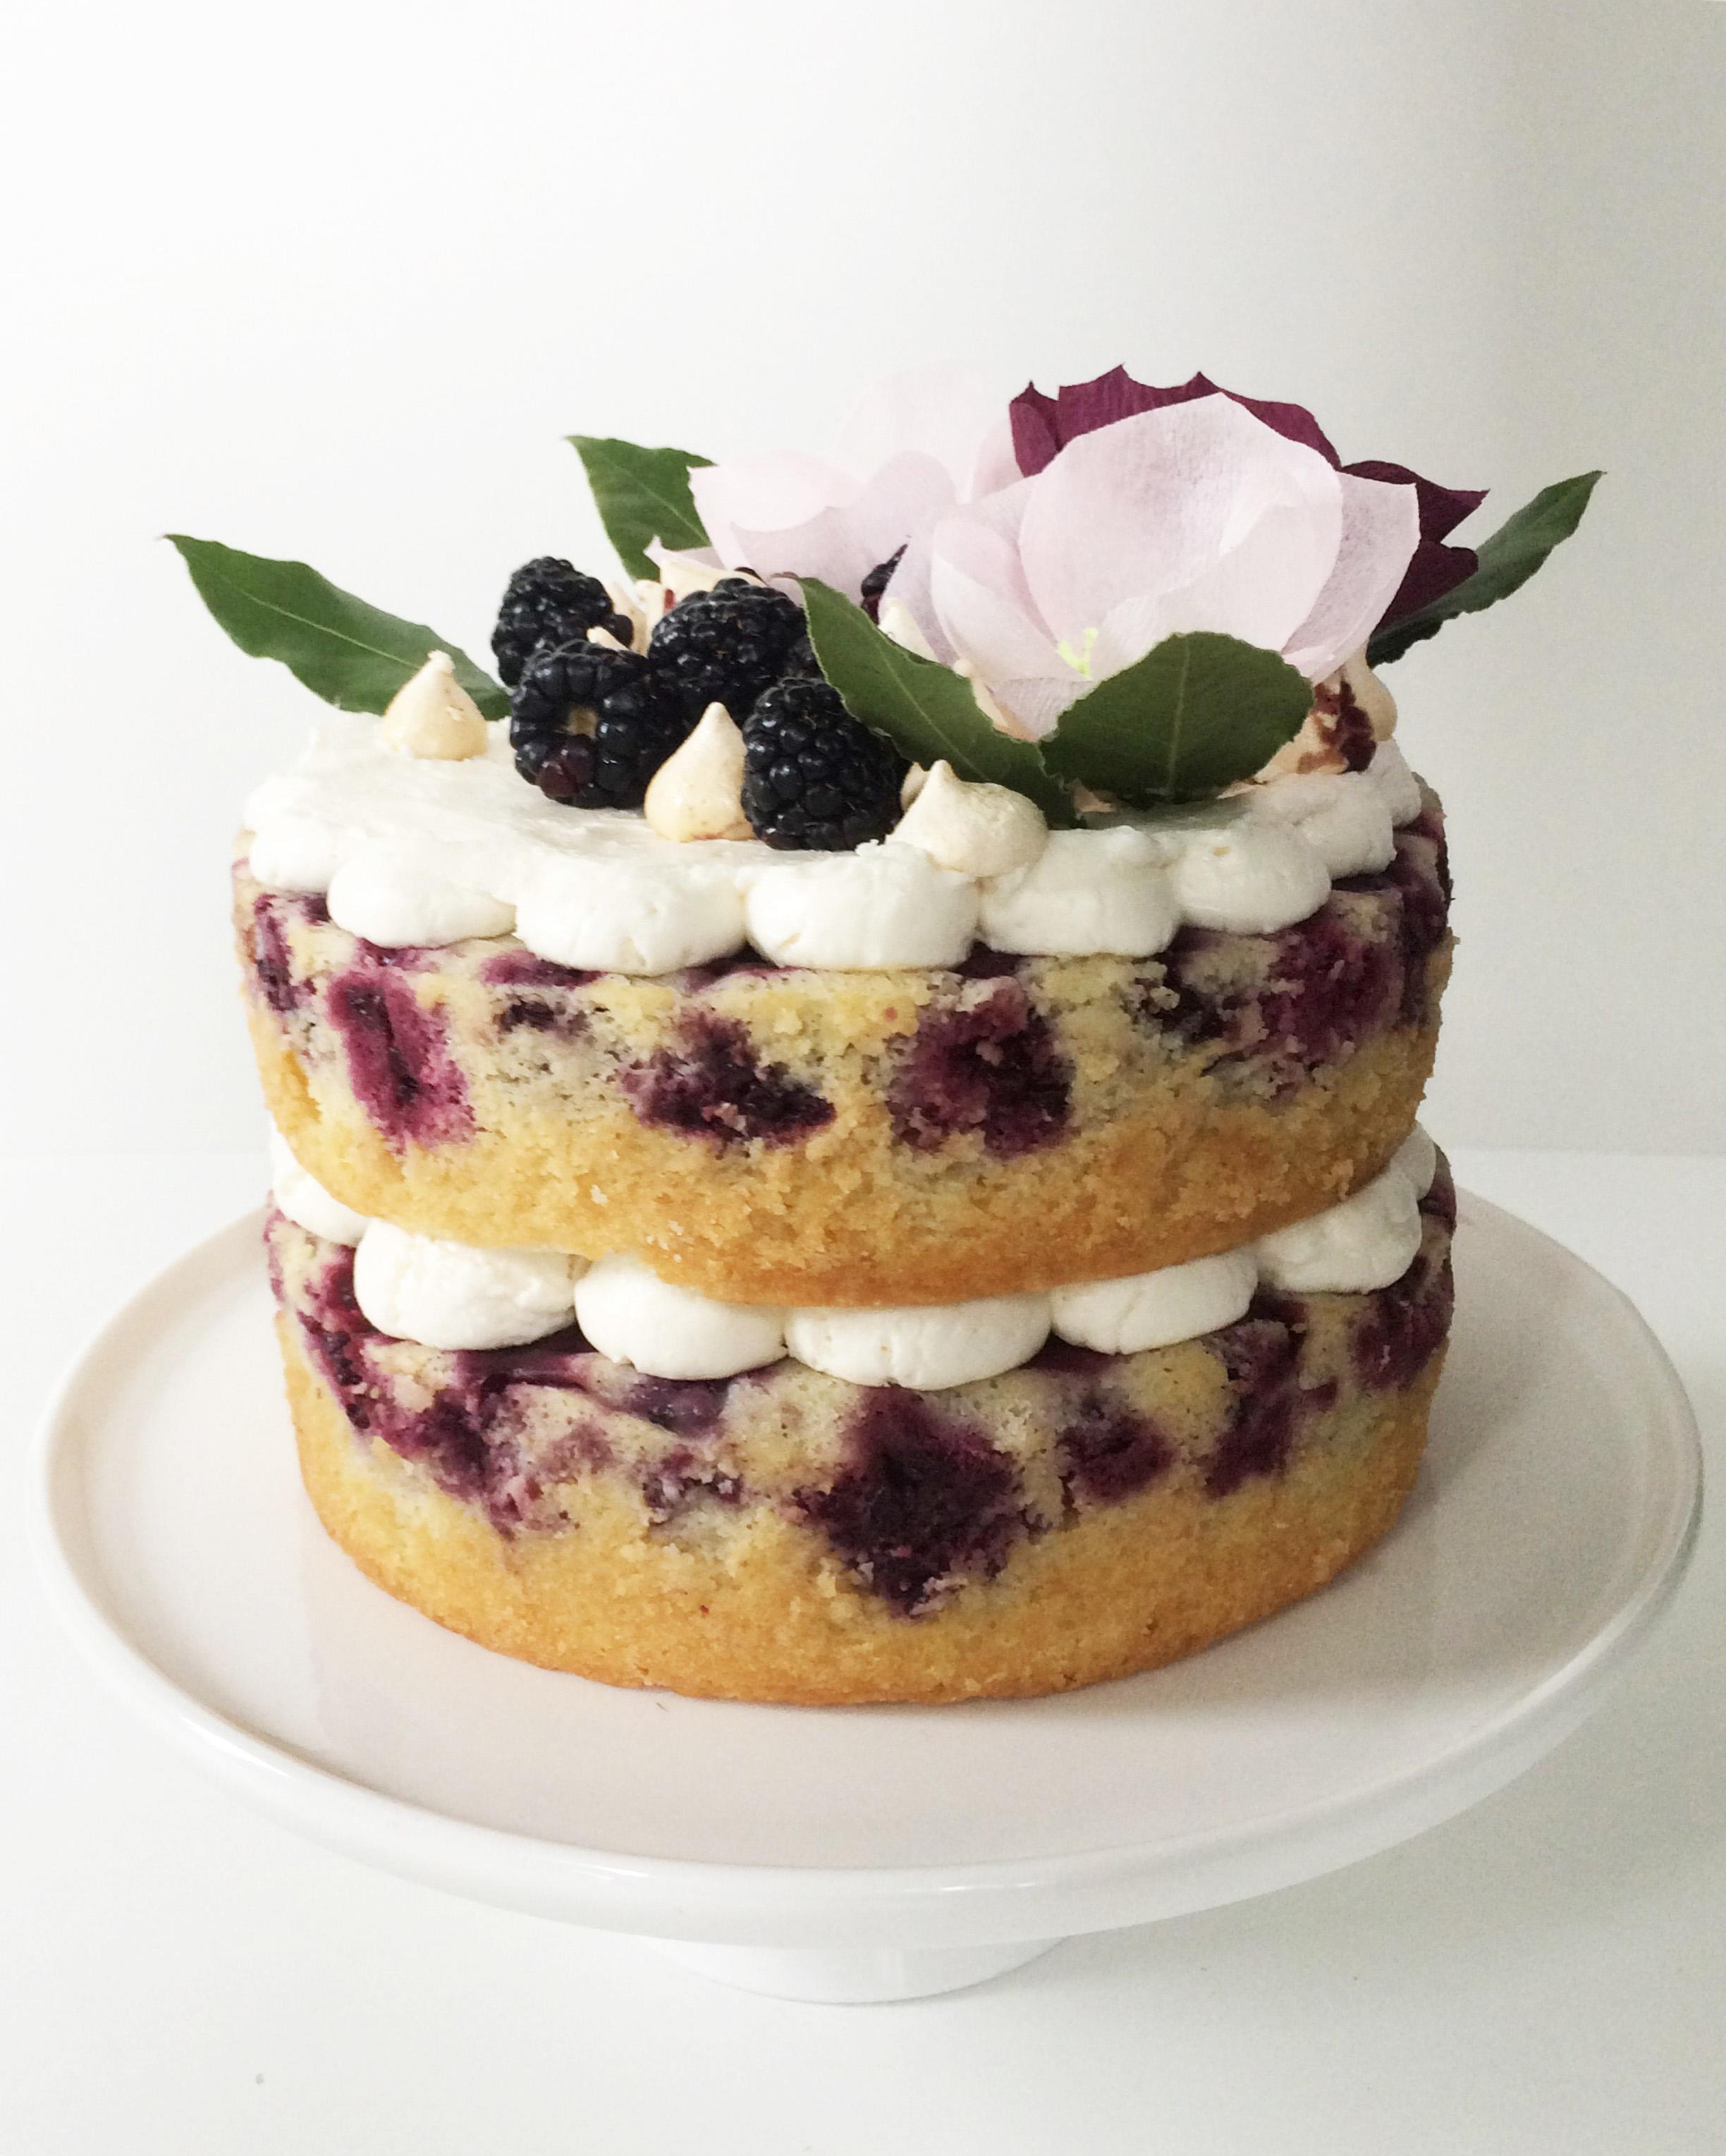 Blackberry Cake with Lavender Buttercream